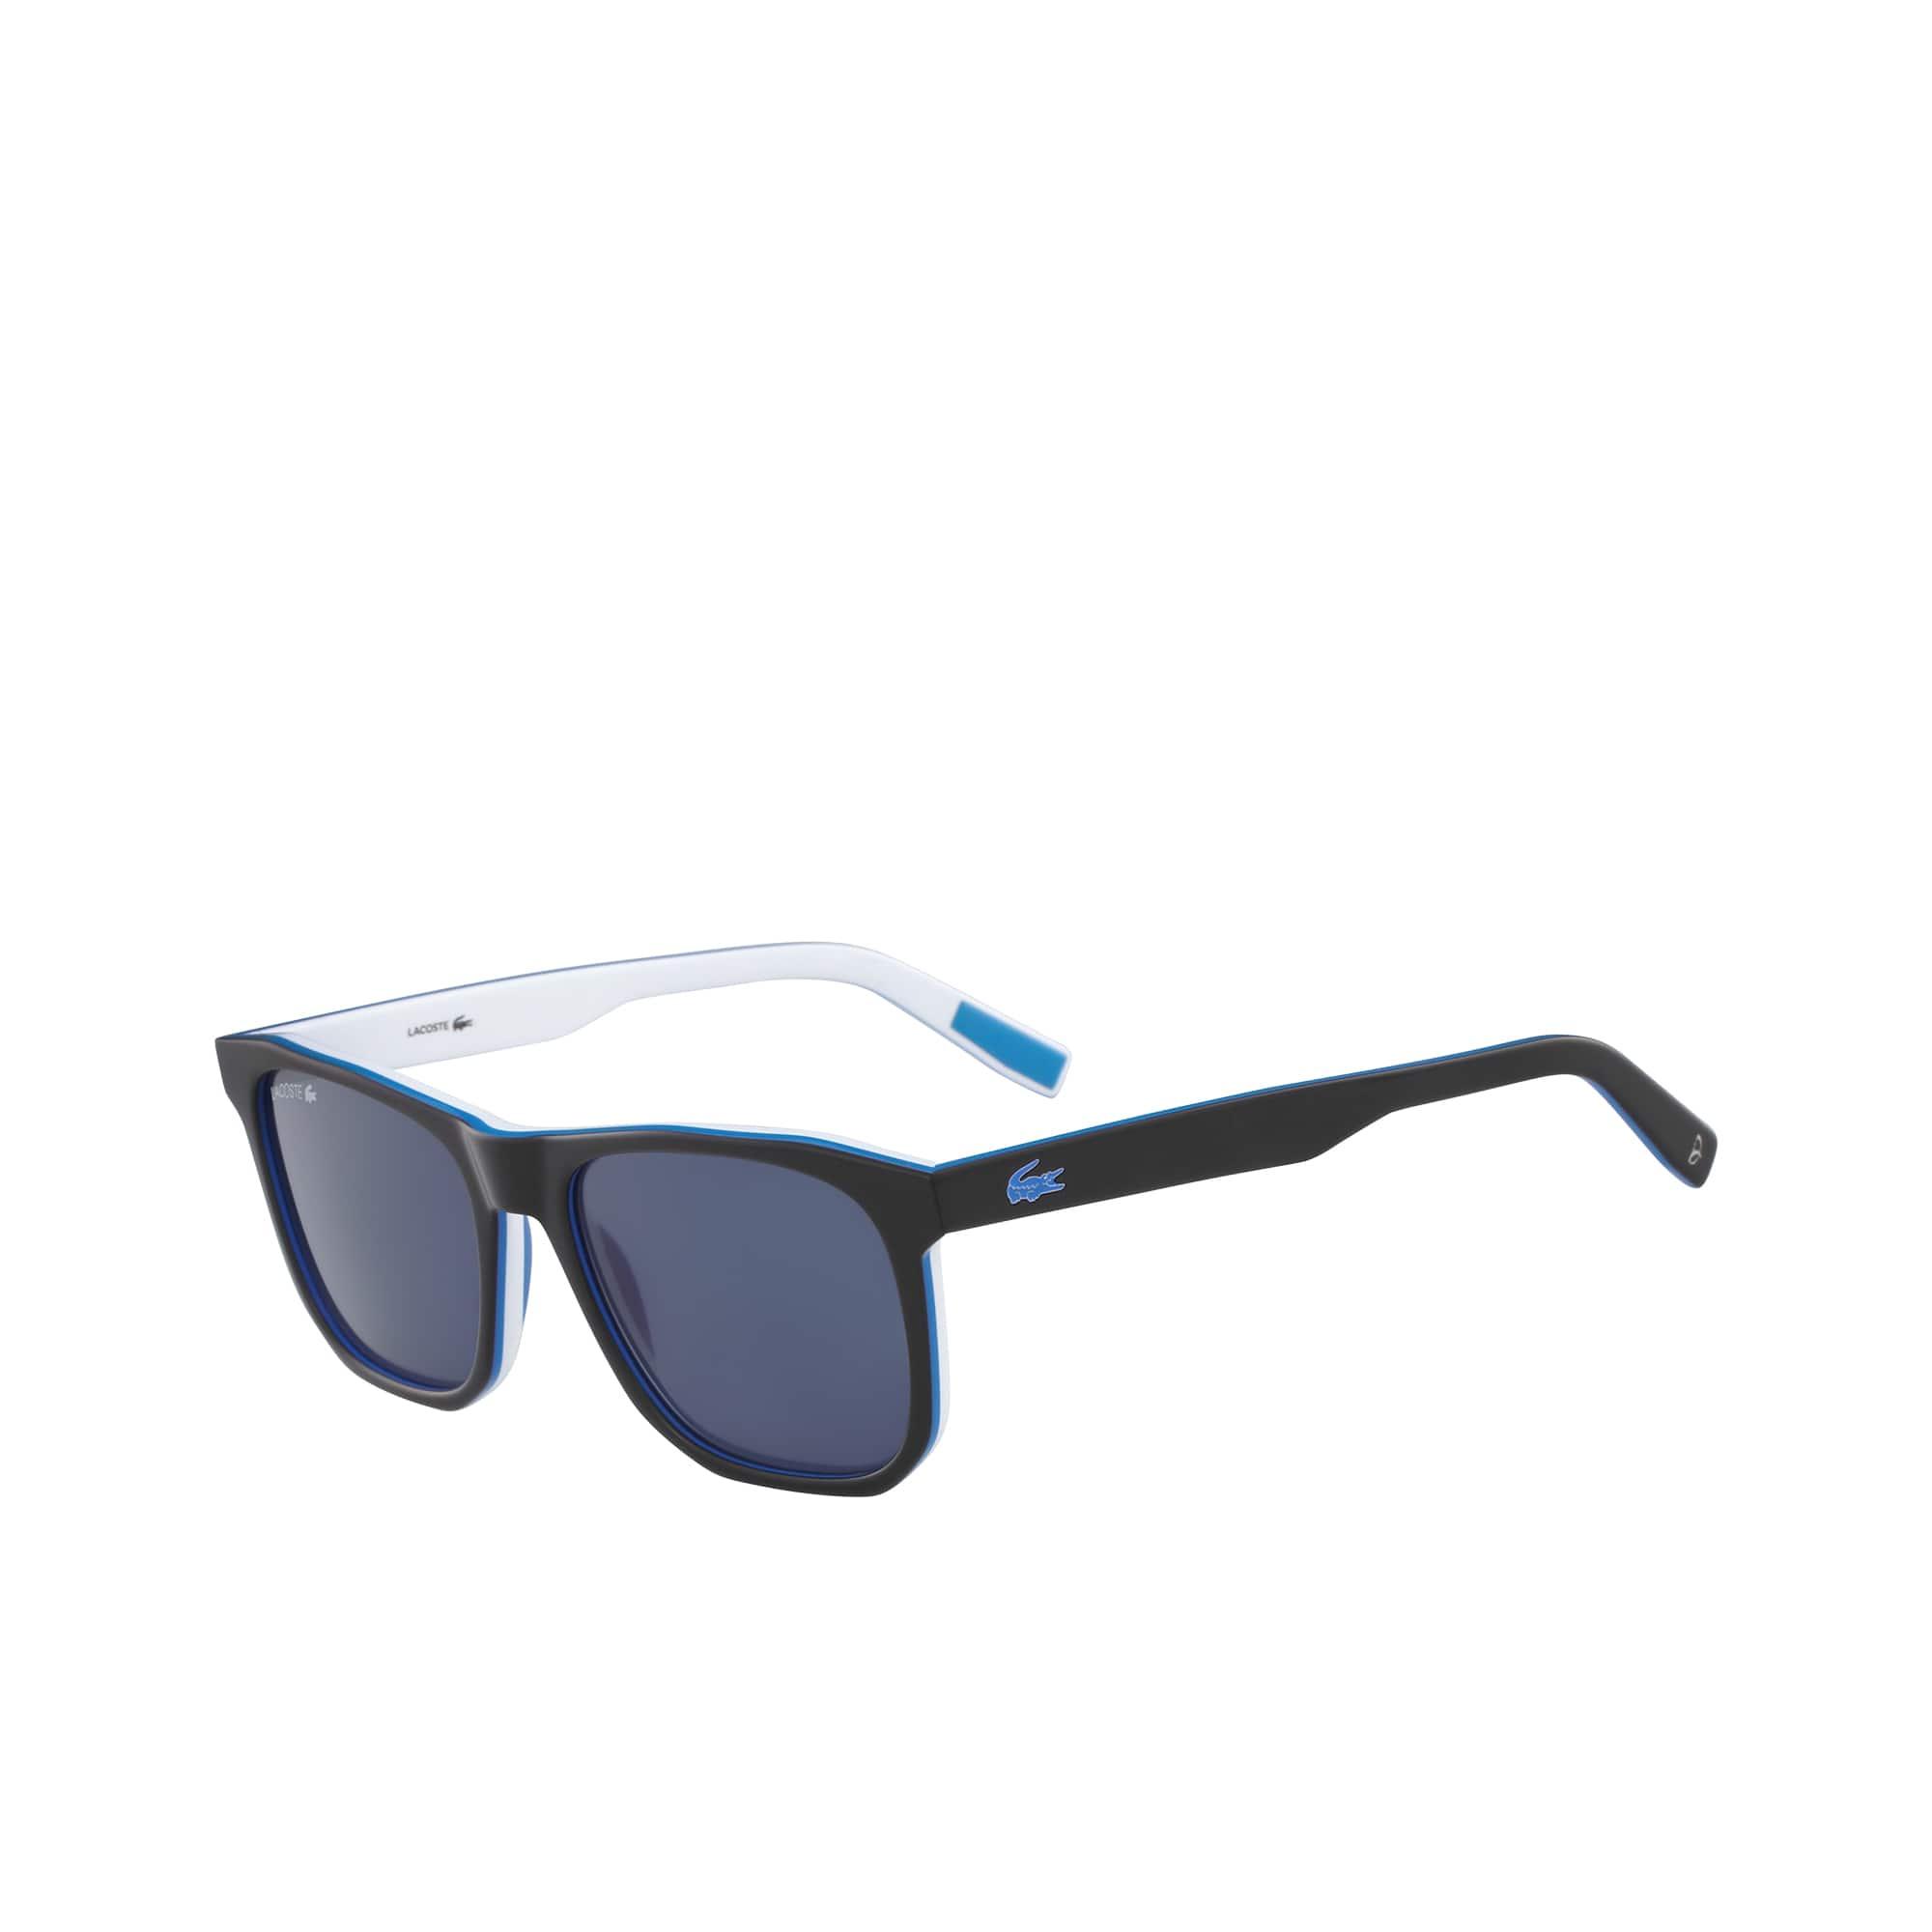 LT12 Sunglasses in Acetate Novak Djokovic Edition